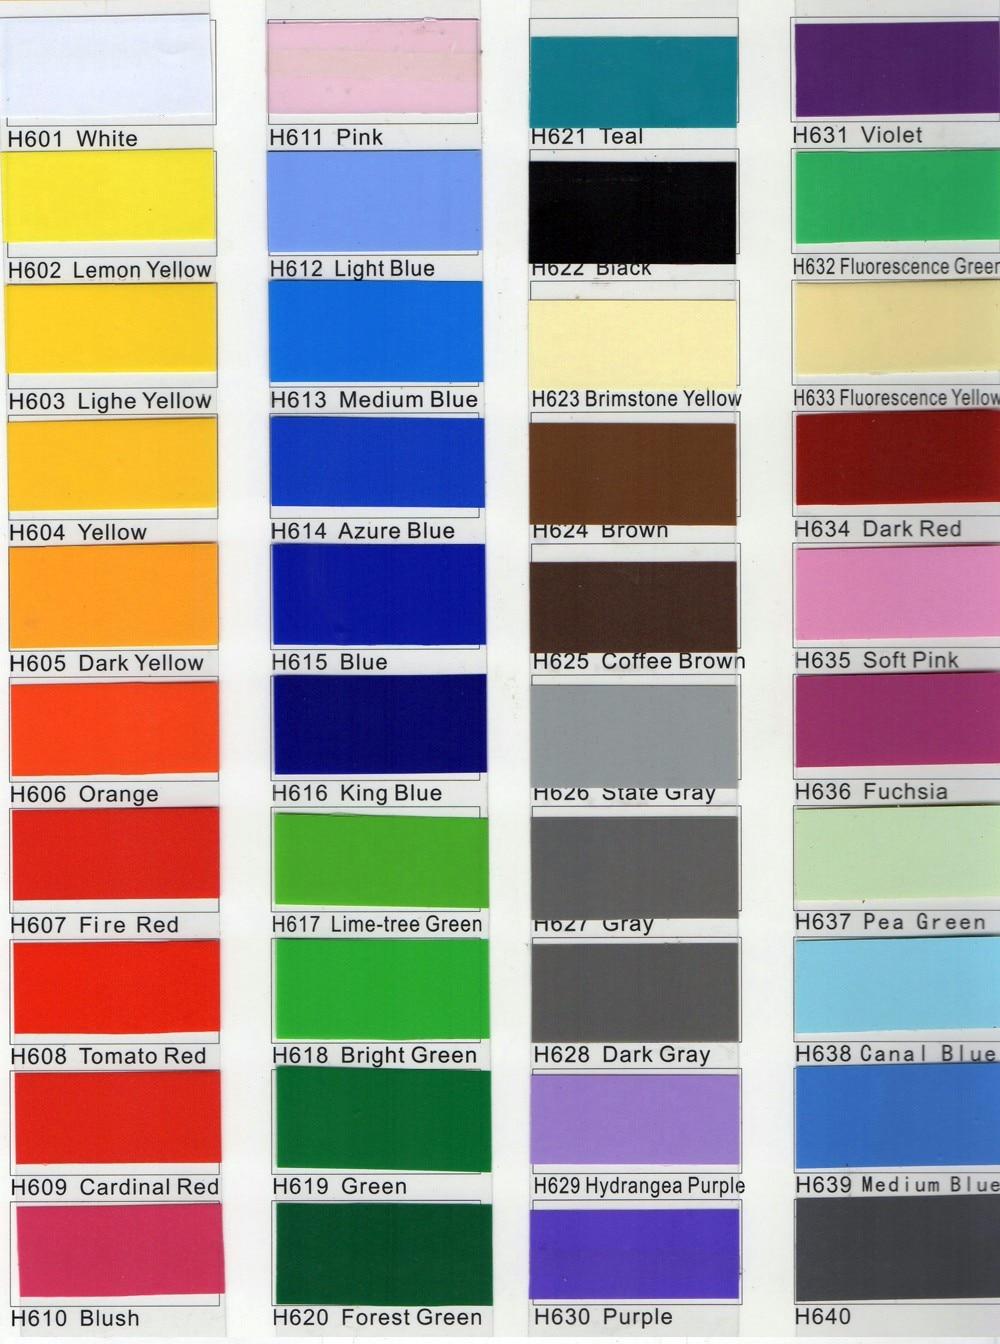 Alien vs predator wall vinyl decal retro film movie poster final color chart nvjuhfo Choice Image